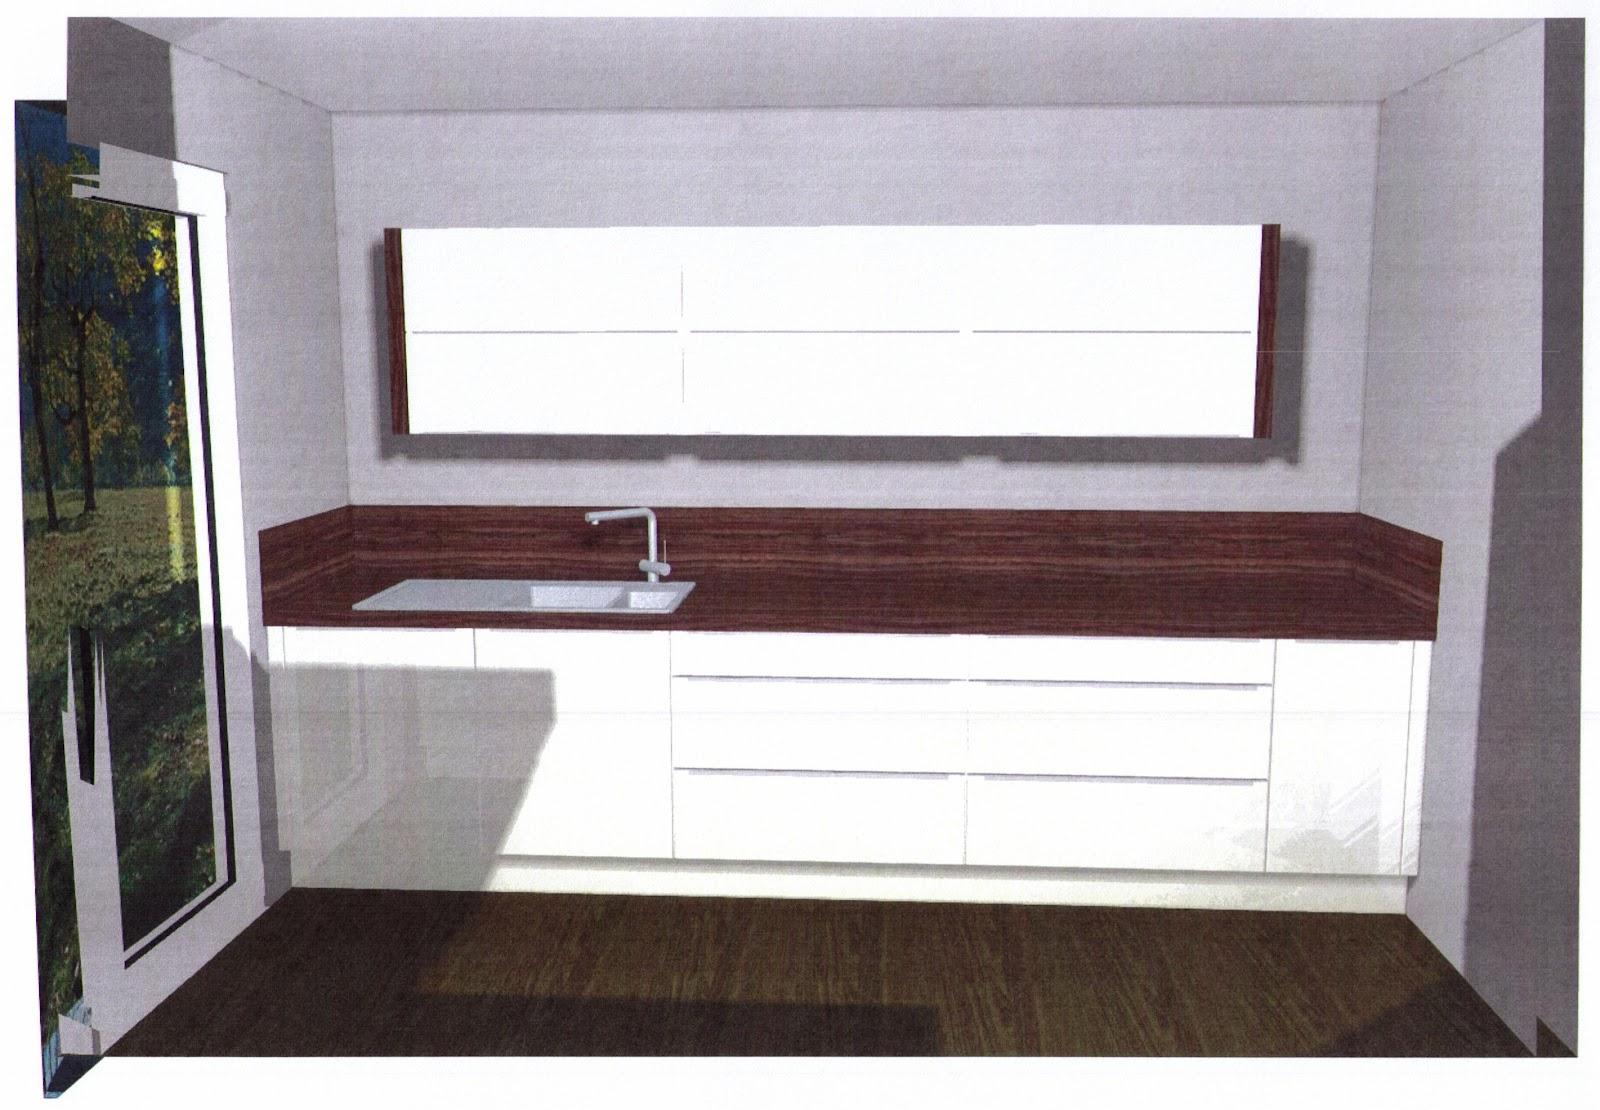 k rten baugebiet meiersberg m rz 2012. Black Bedroom Furniture Sets. Home Design Ideas